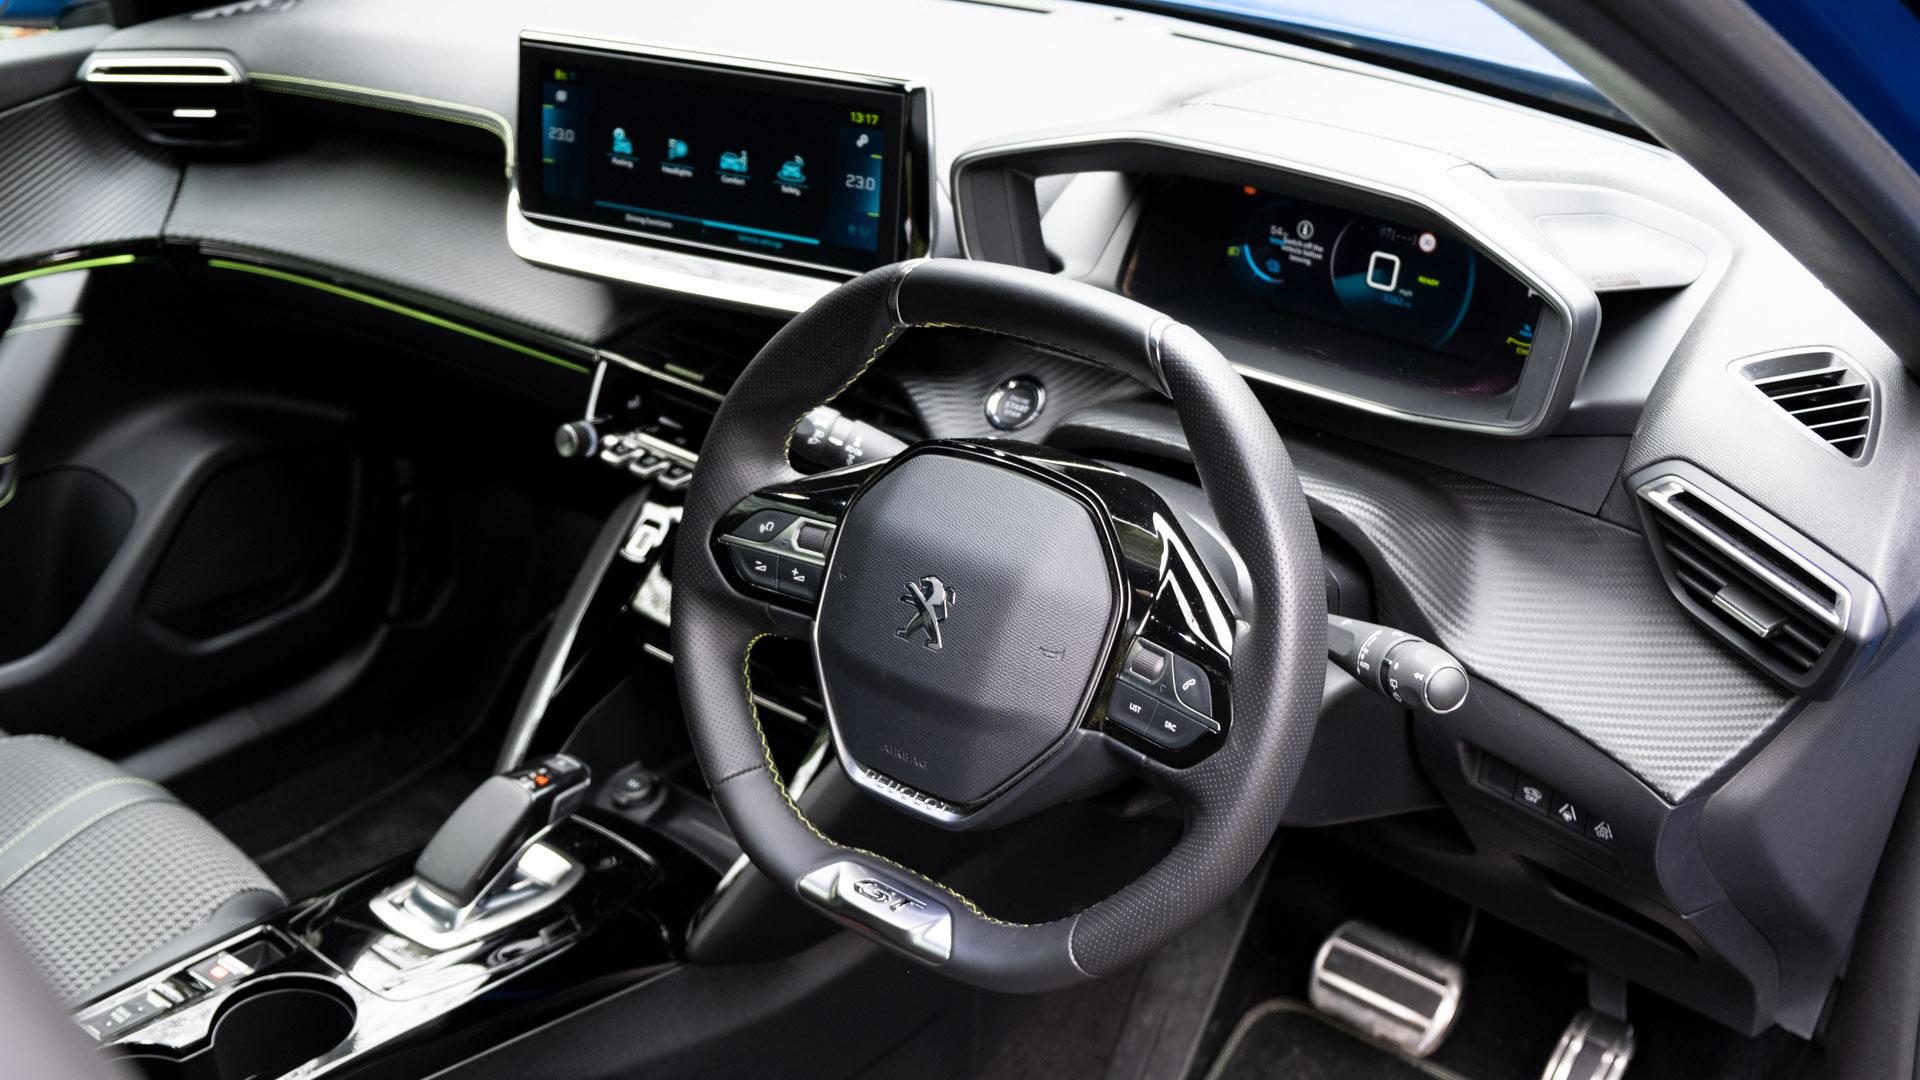 Peugeot e-2008 cabin